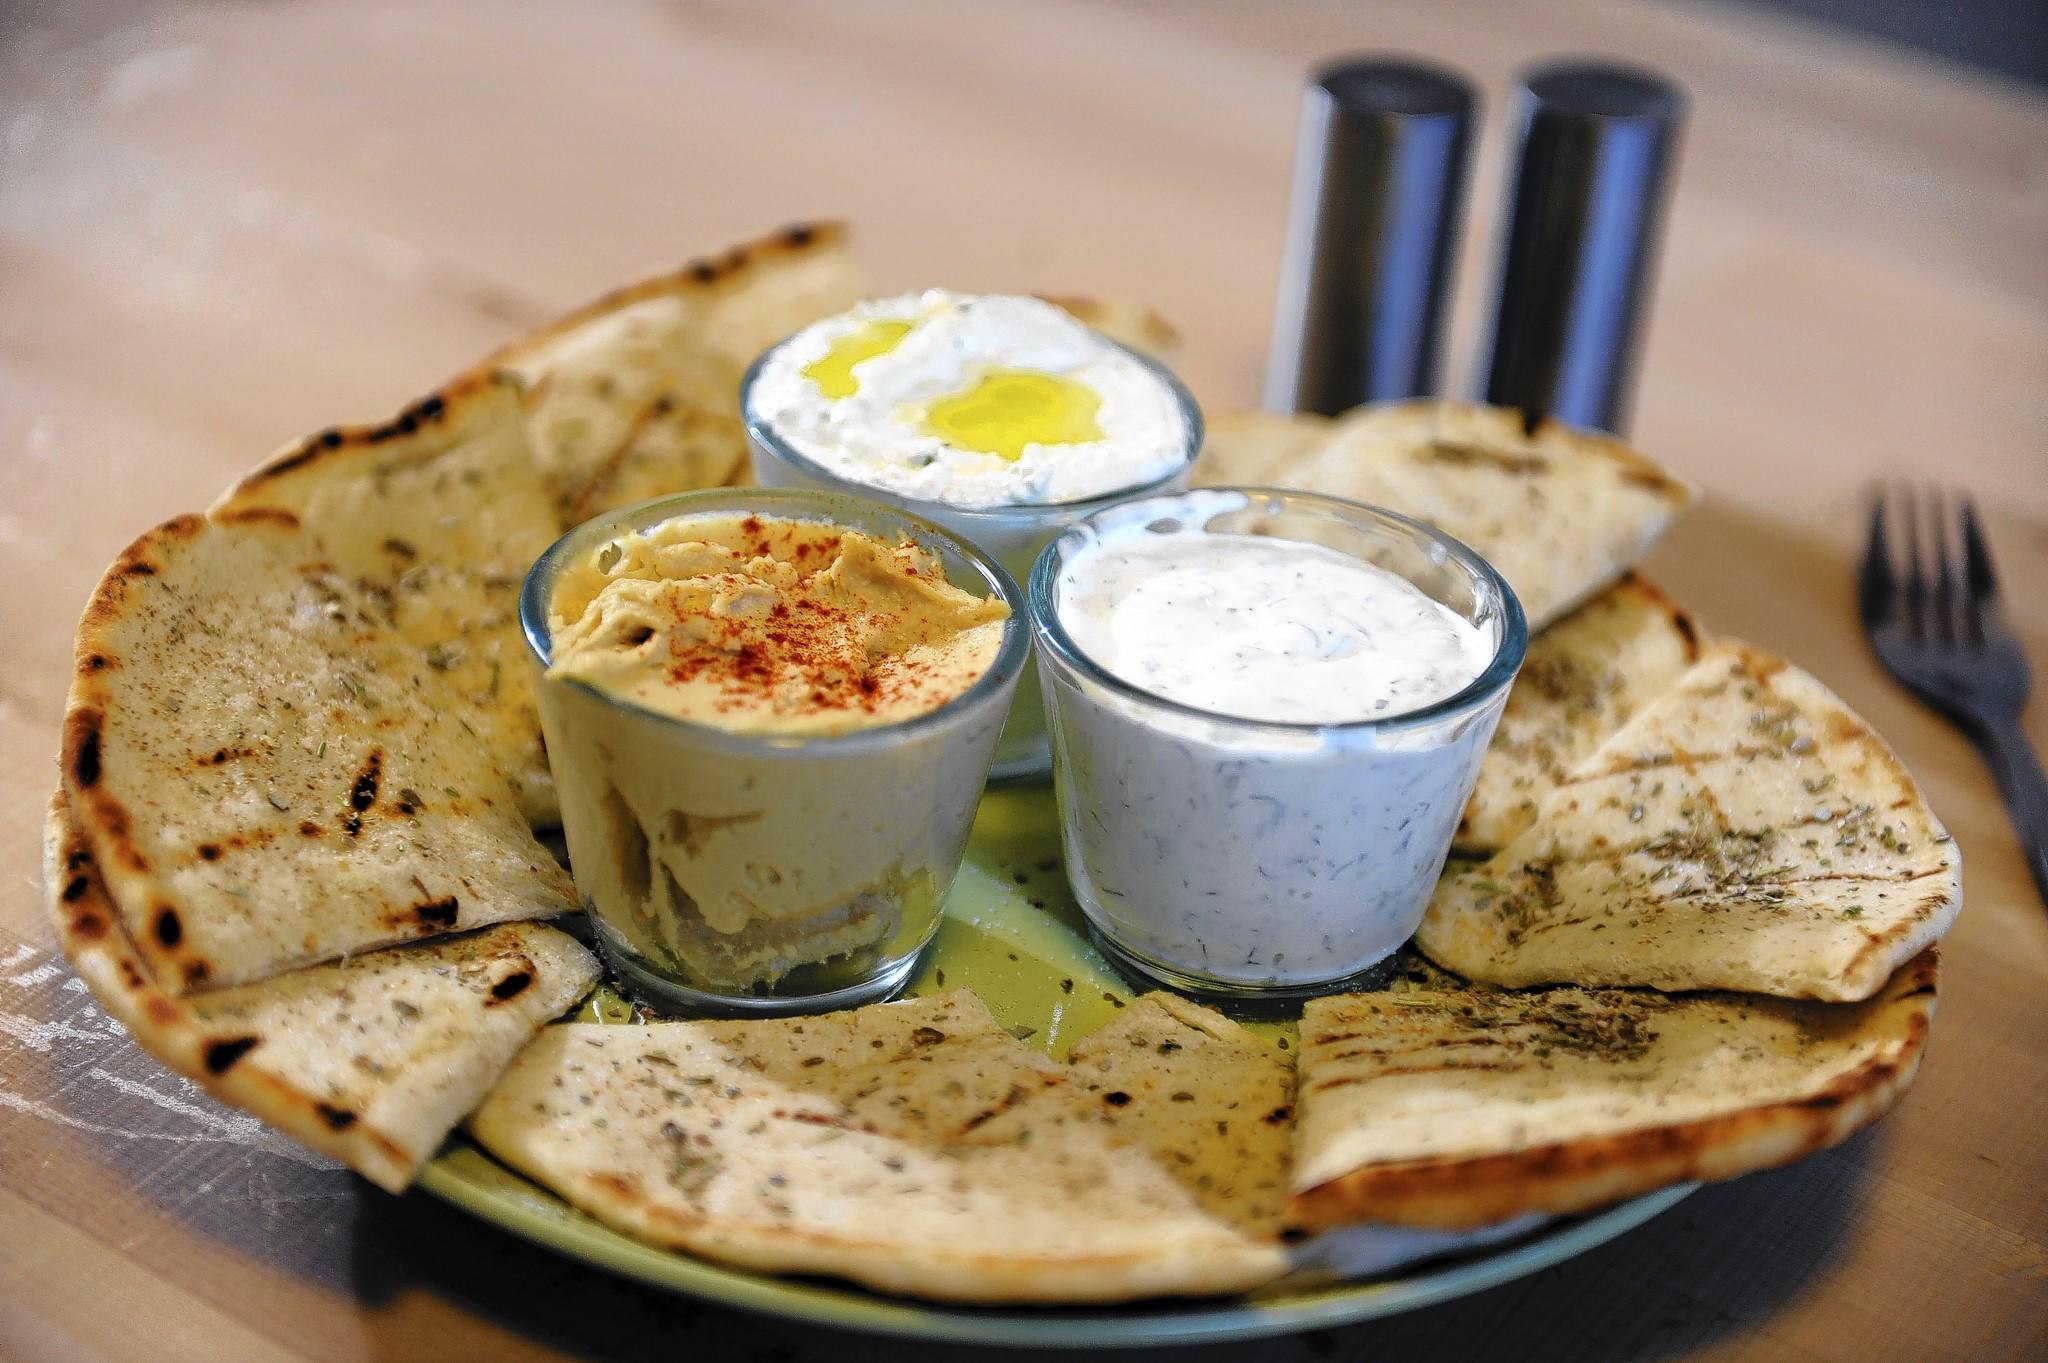 Good Greek food, friendly people at Souvlaki in Hampden